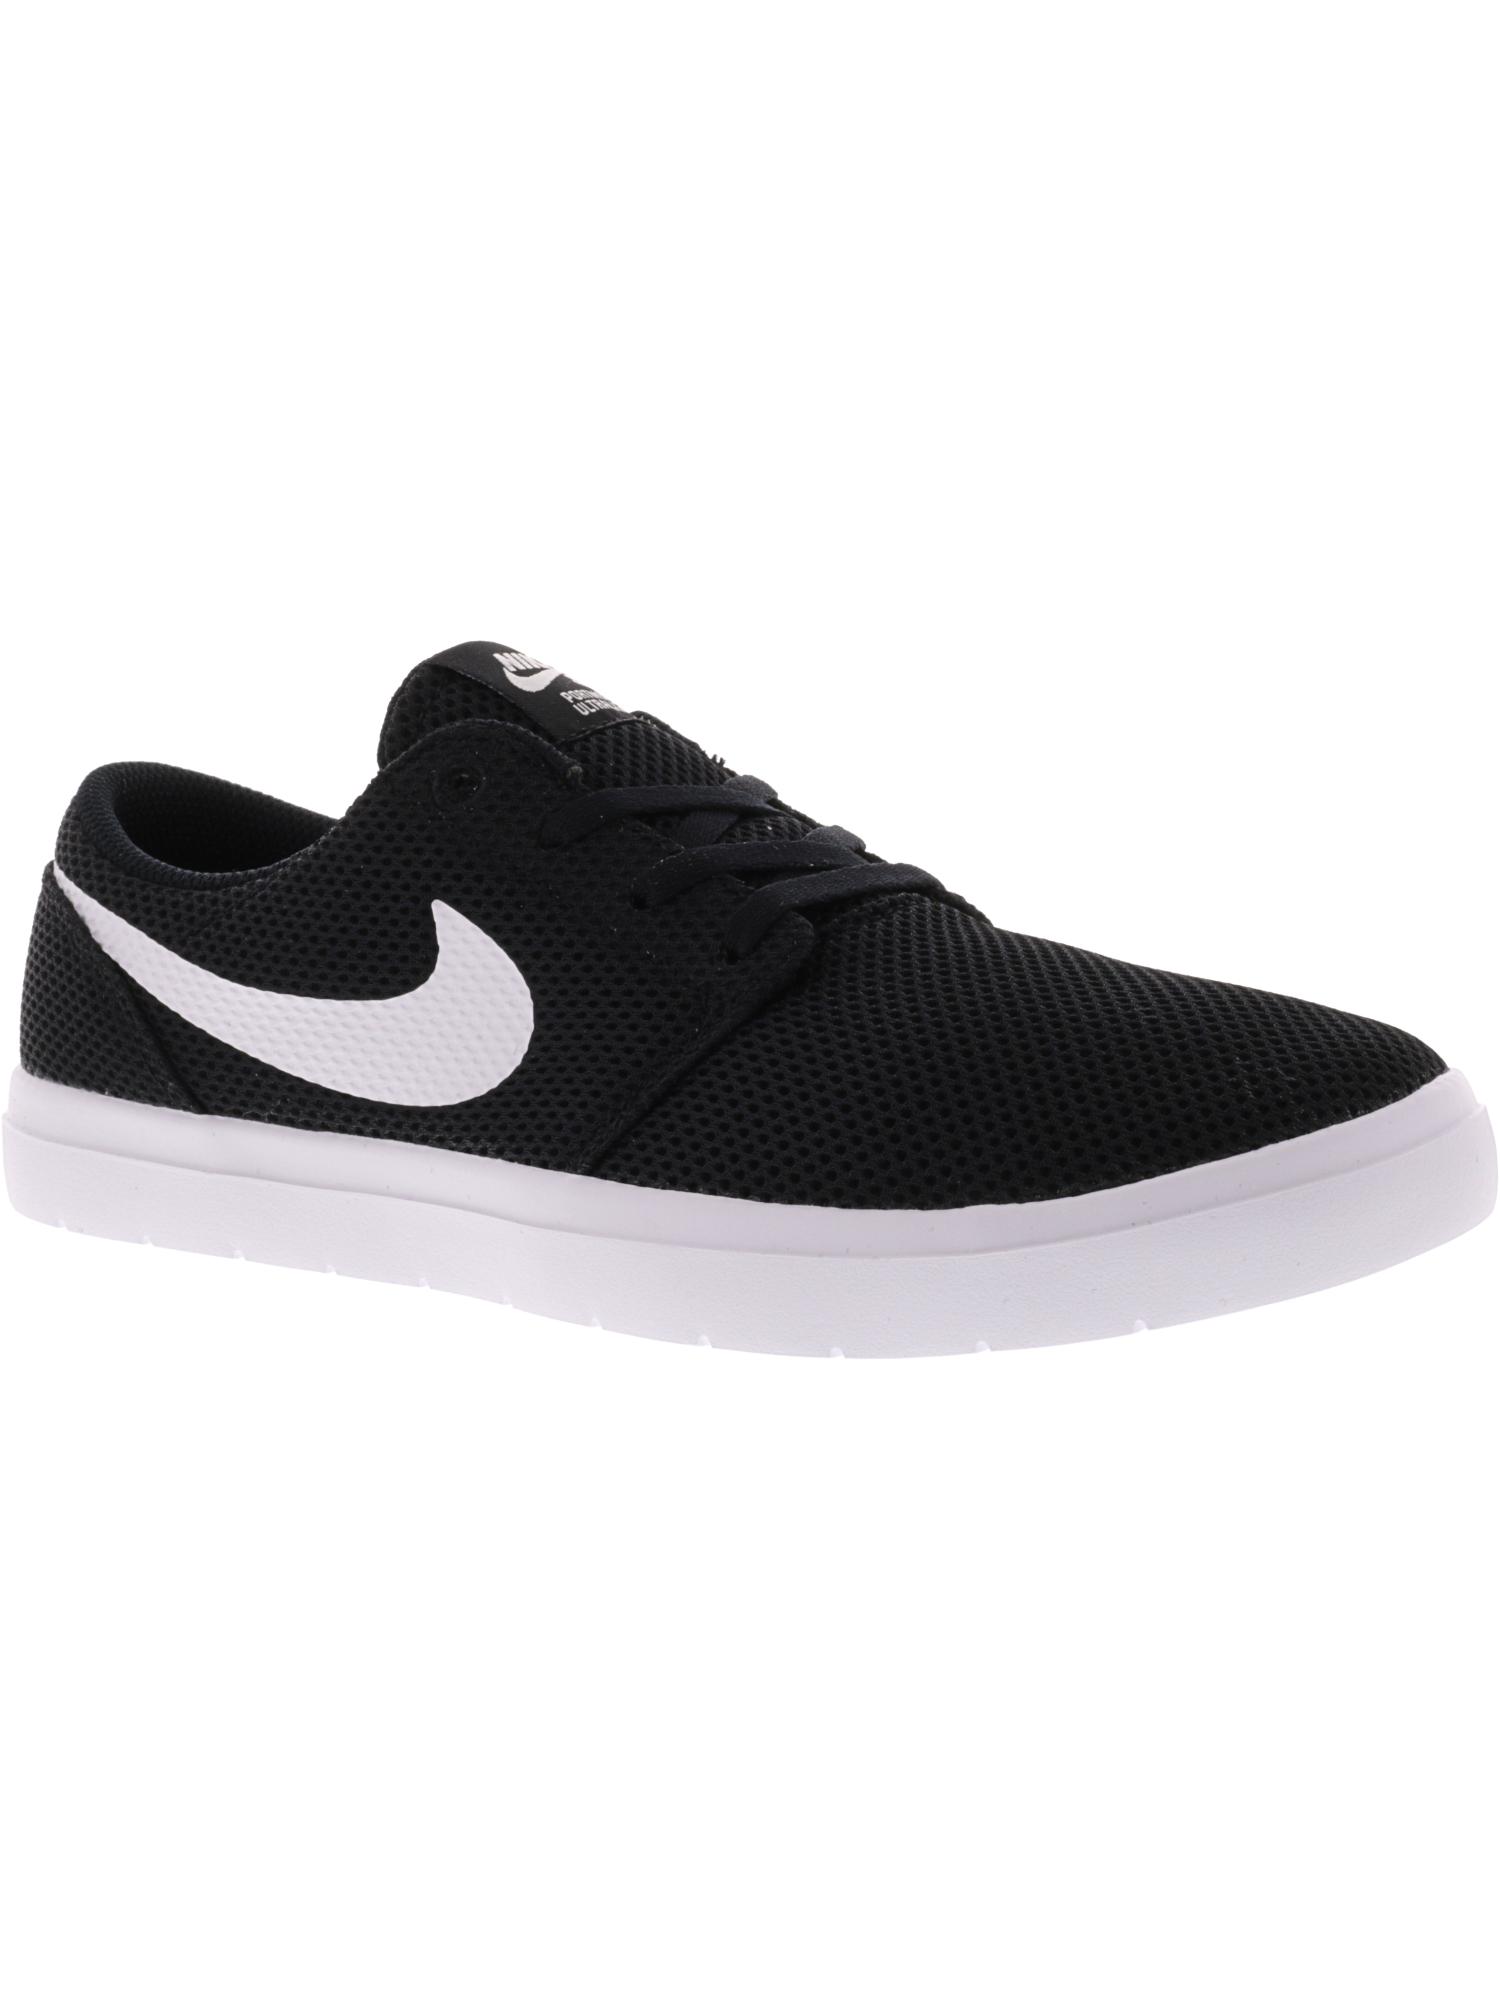 21cec1e45ae65 Details about Nike Men's Sb Portmore Ii Ultralight Ankle-High Skateboarding  Shoe